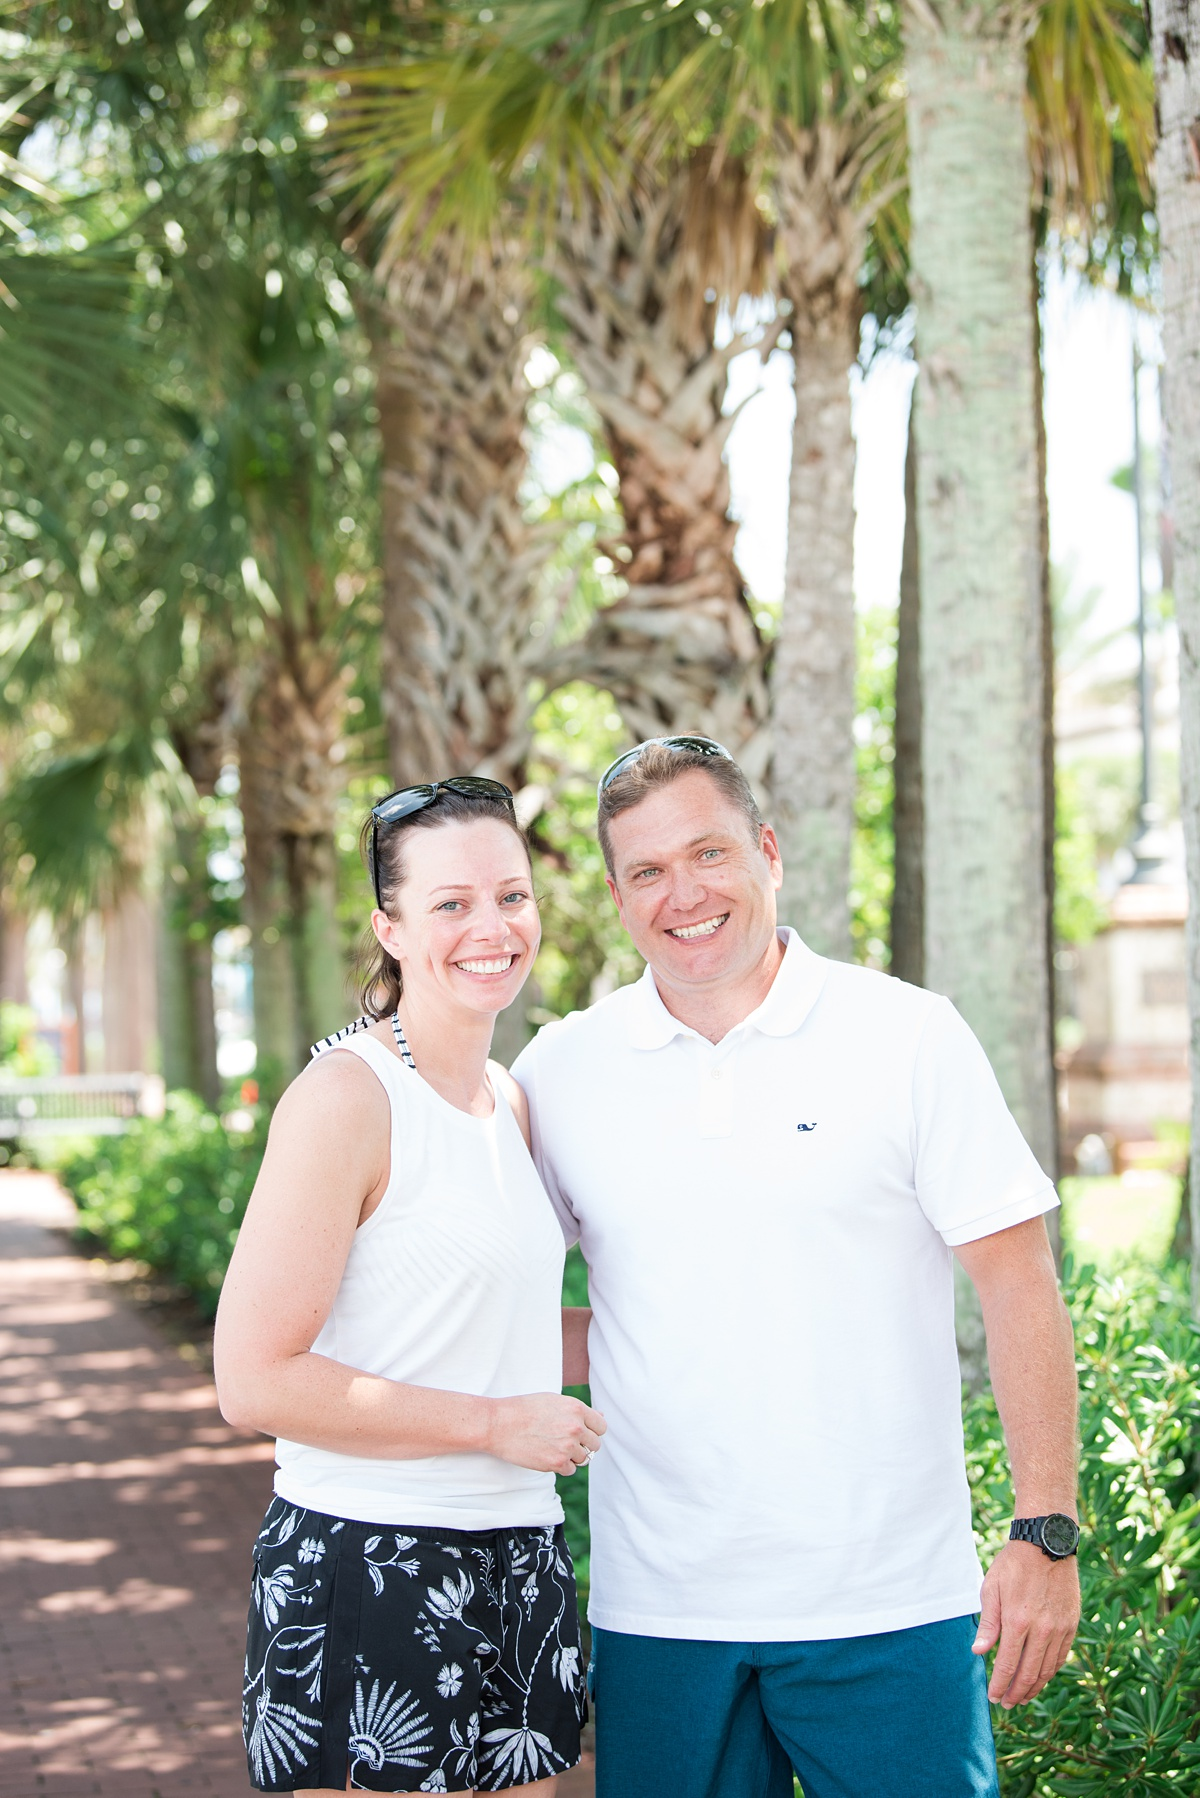 Atlantic Beach Proposal_Planning a Proposal_Jacksonville Florida Wedding Photographer_Engagement Portraits_3.jpg